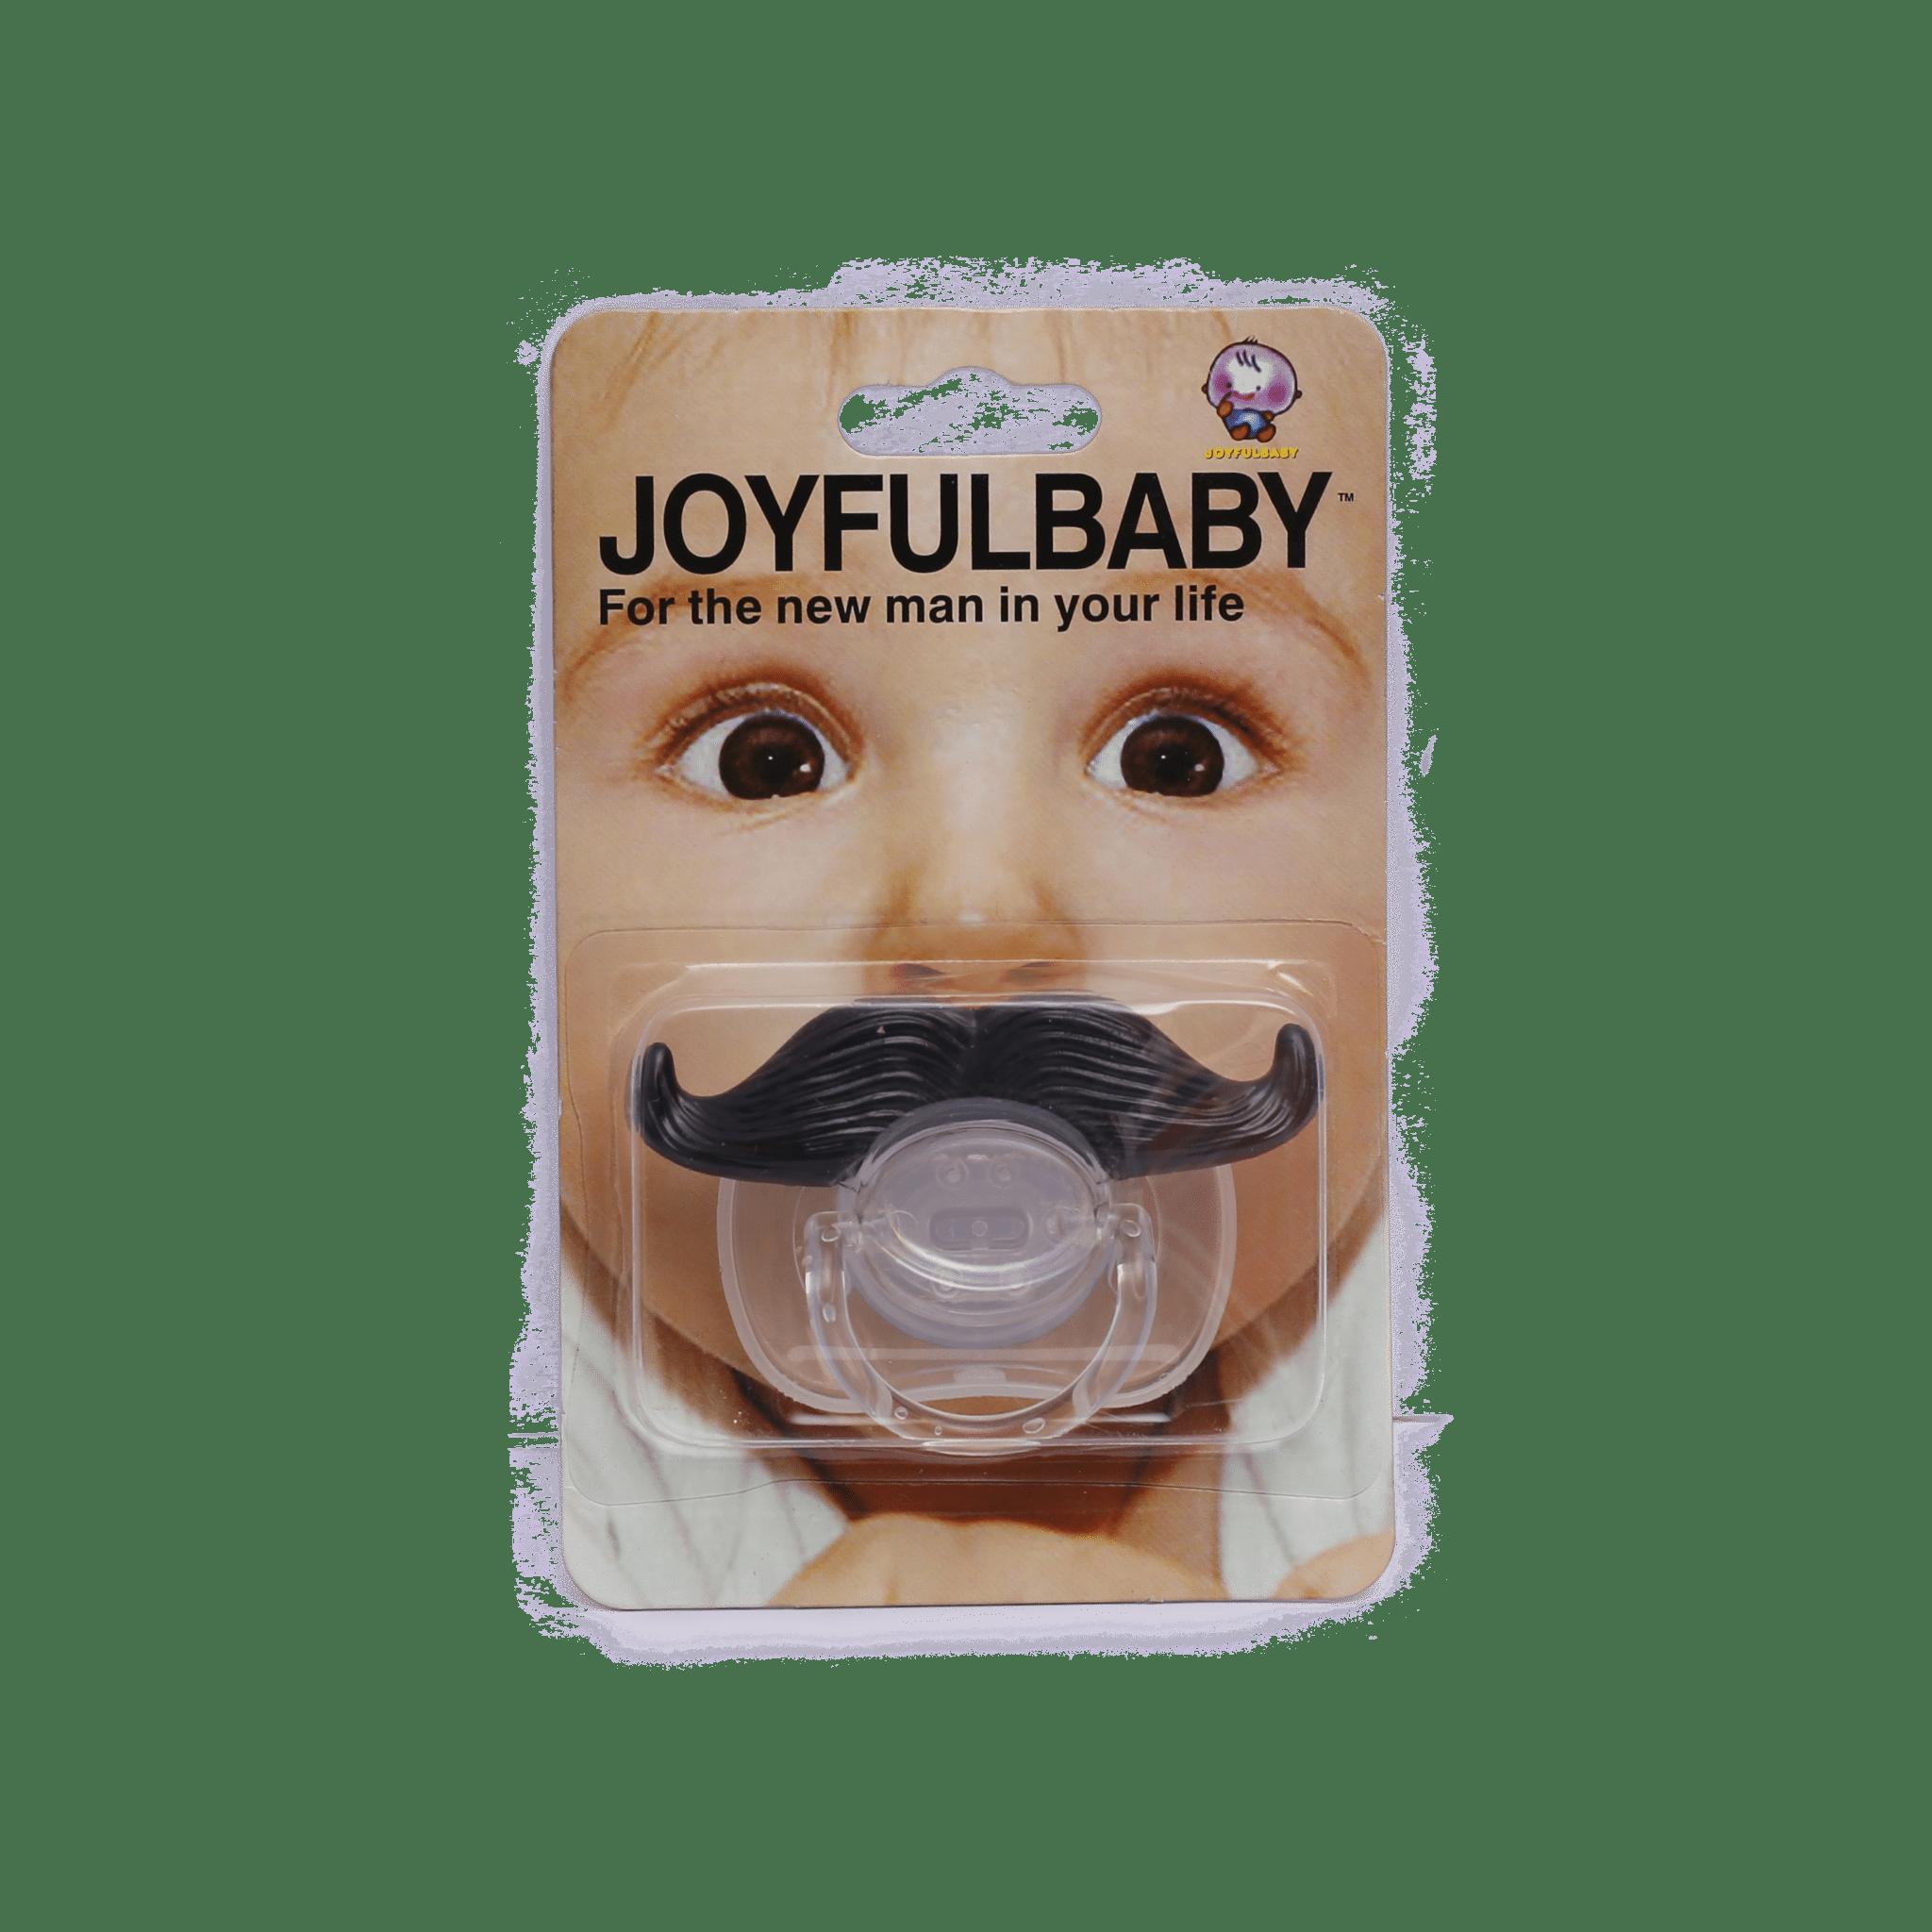 Joyful Baby Pacifier/Soother